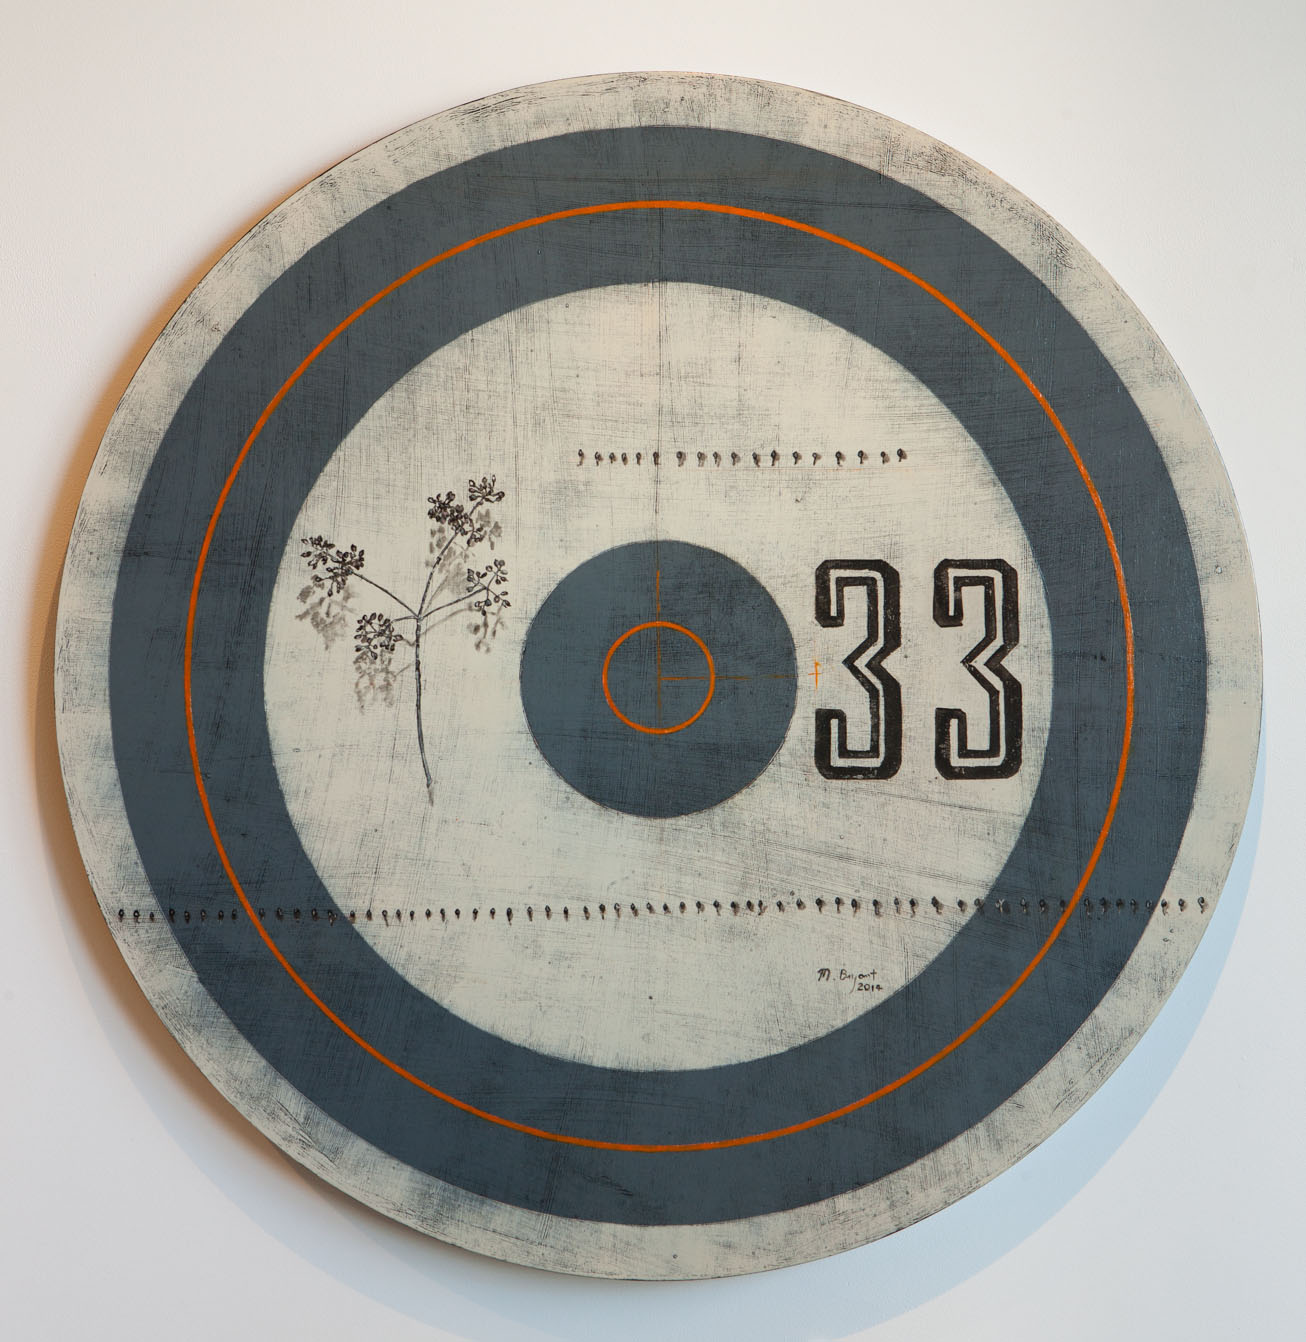 Tarata 33 Michele Bryant, 2014